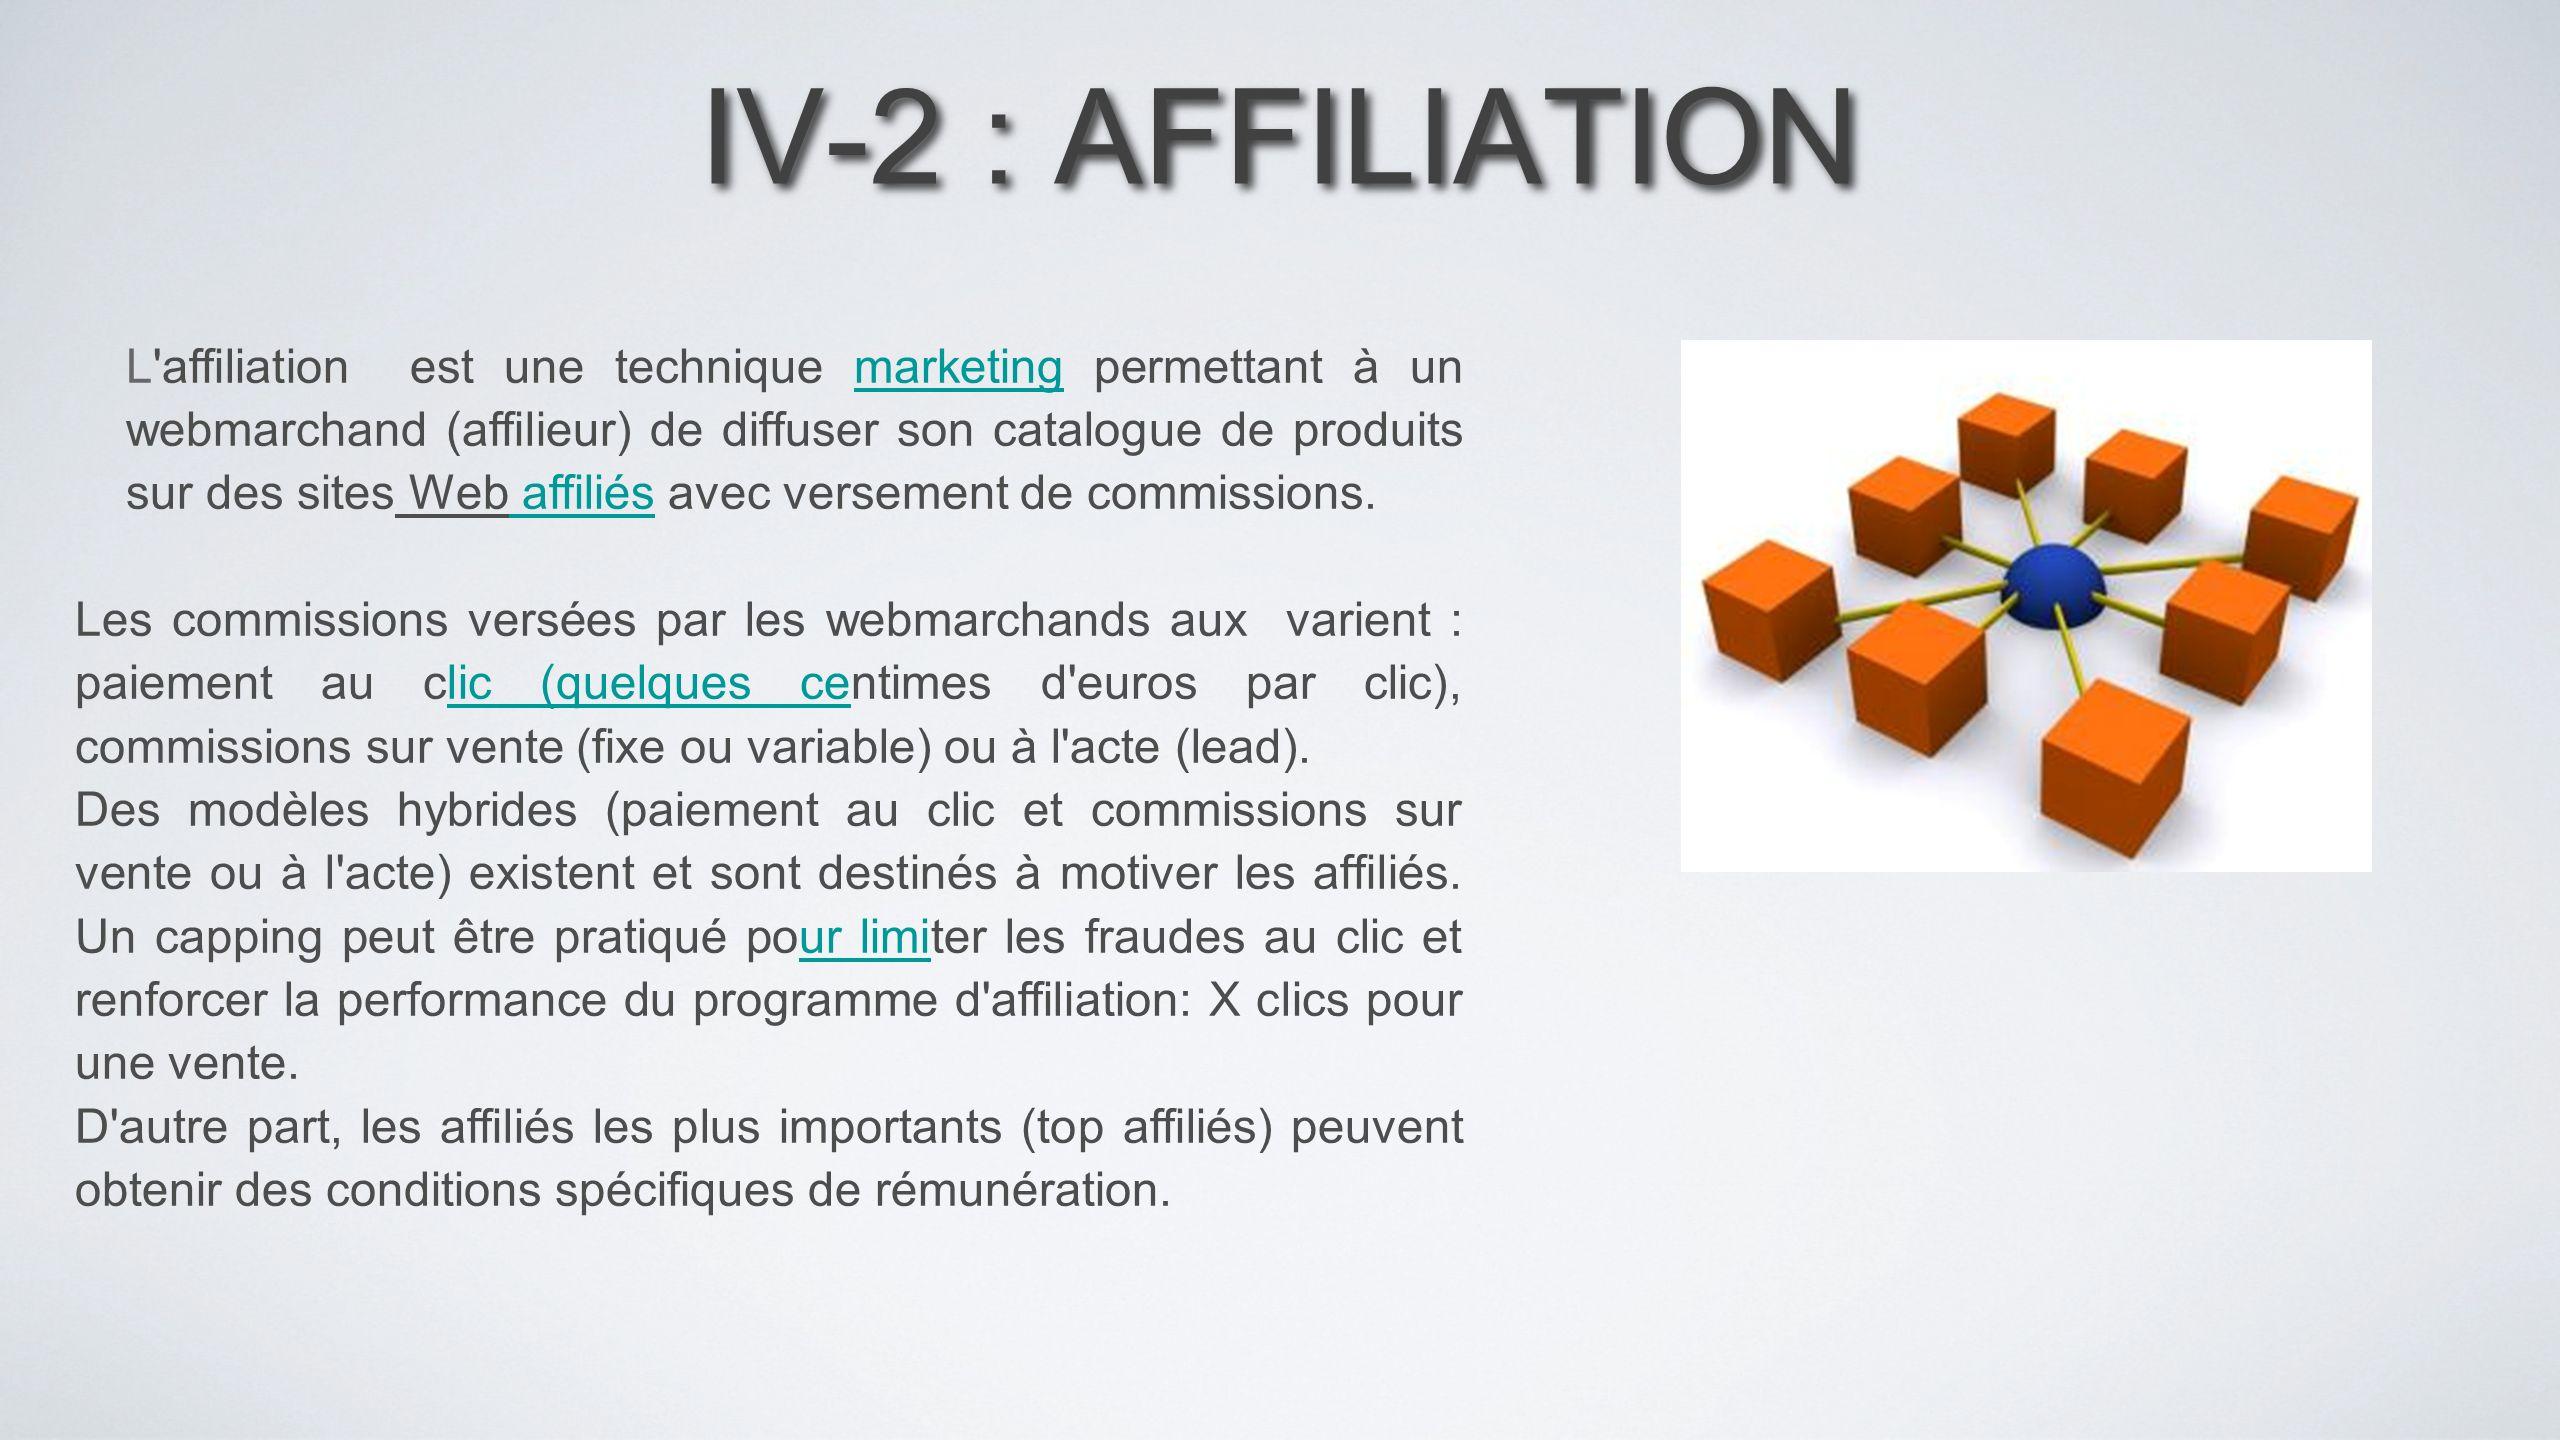 IV-2 : AFFILIATION